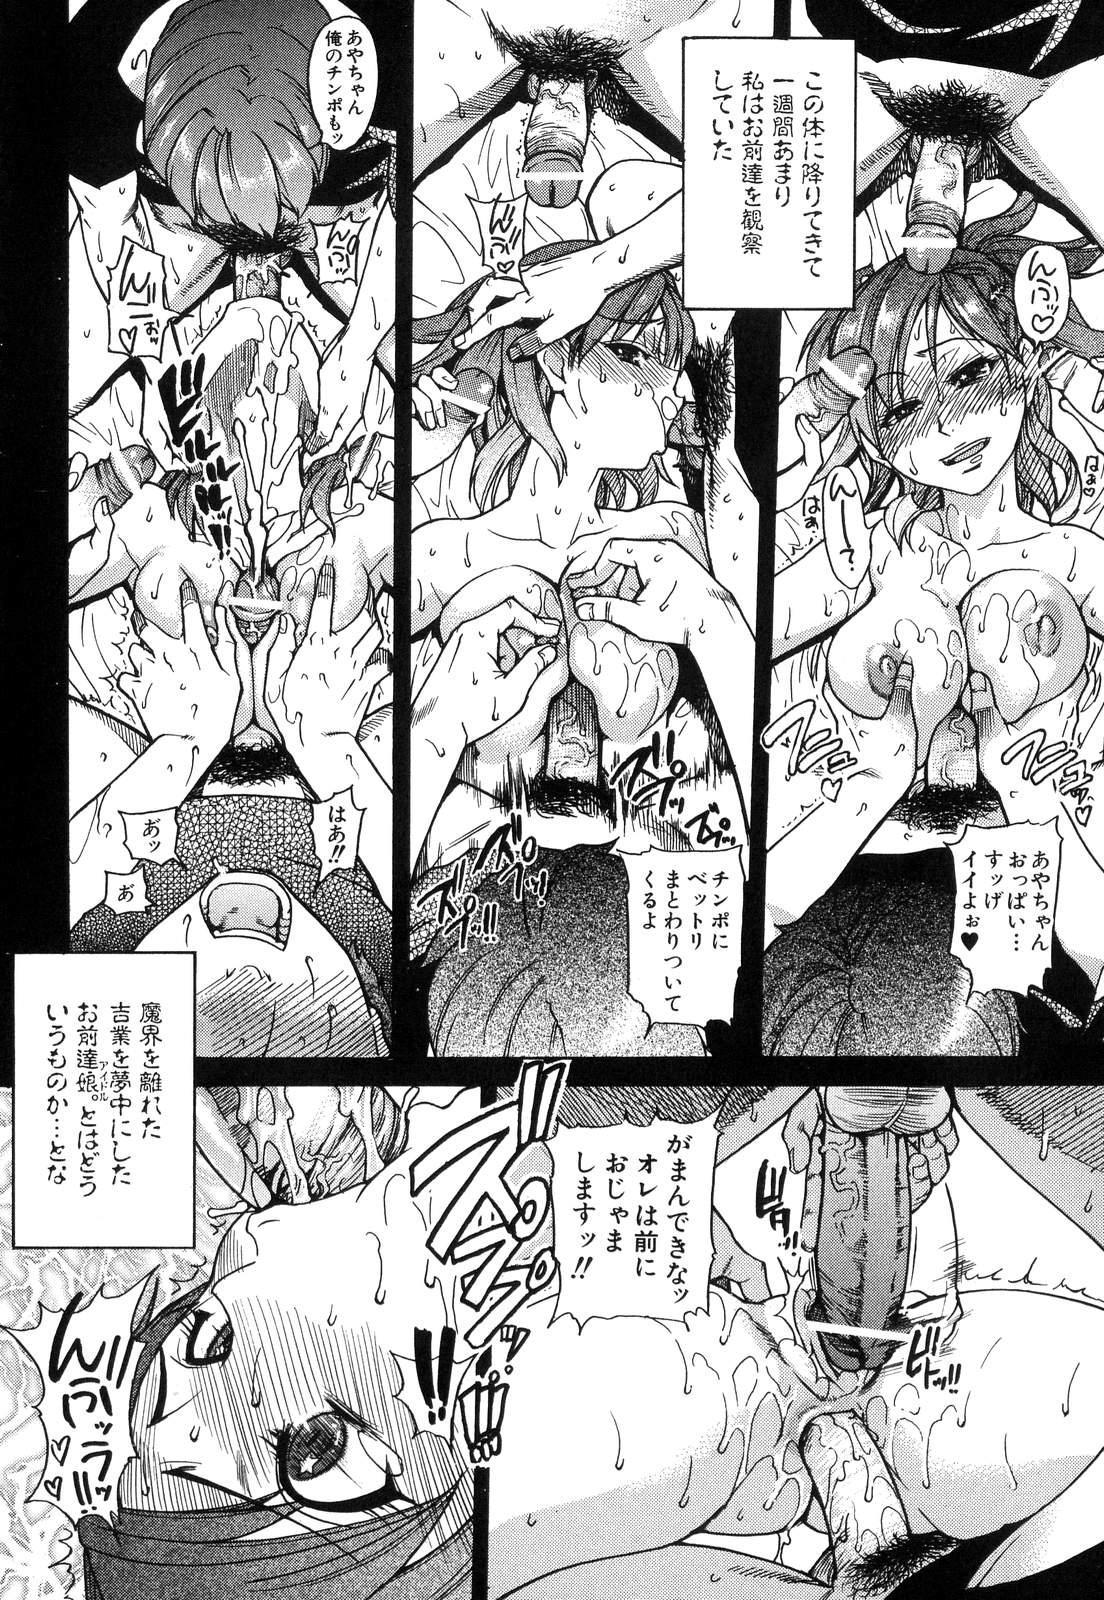 Shining Musume. 6. Rainbow Six 80